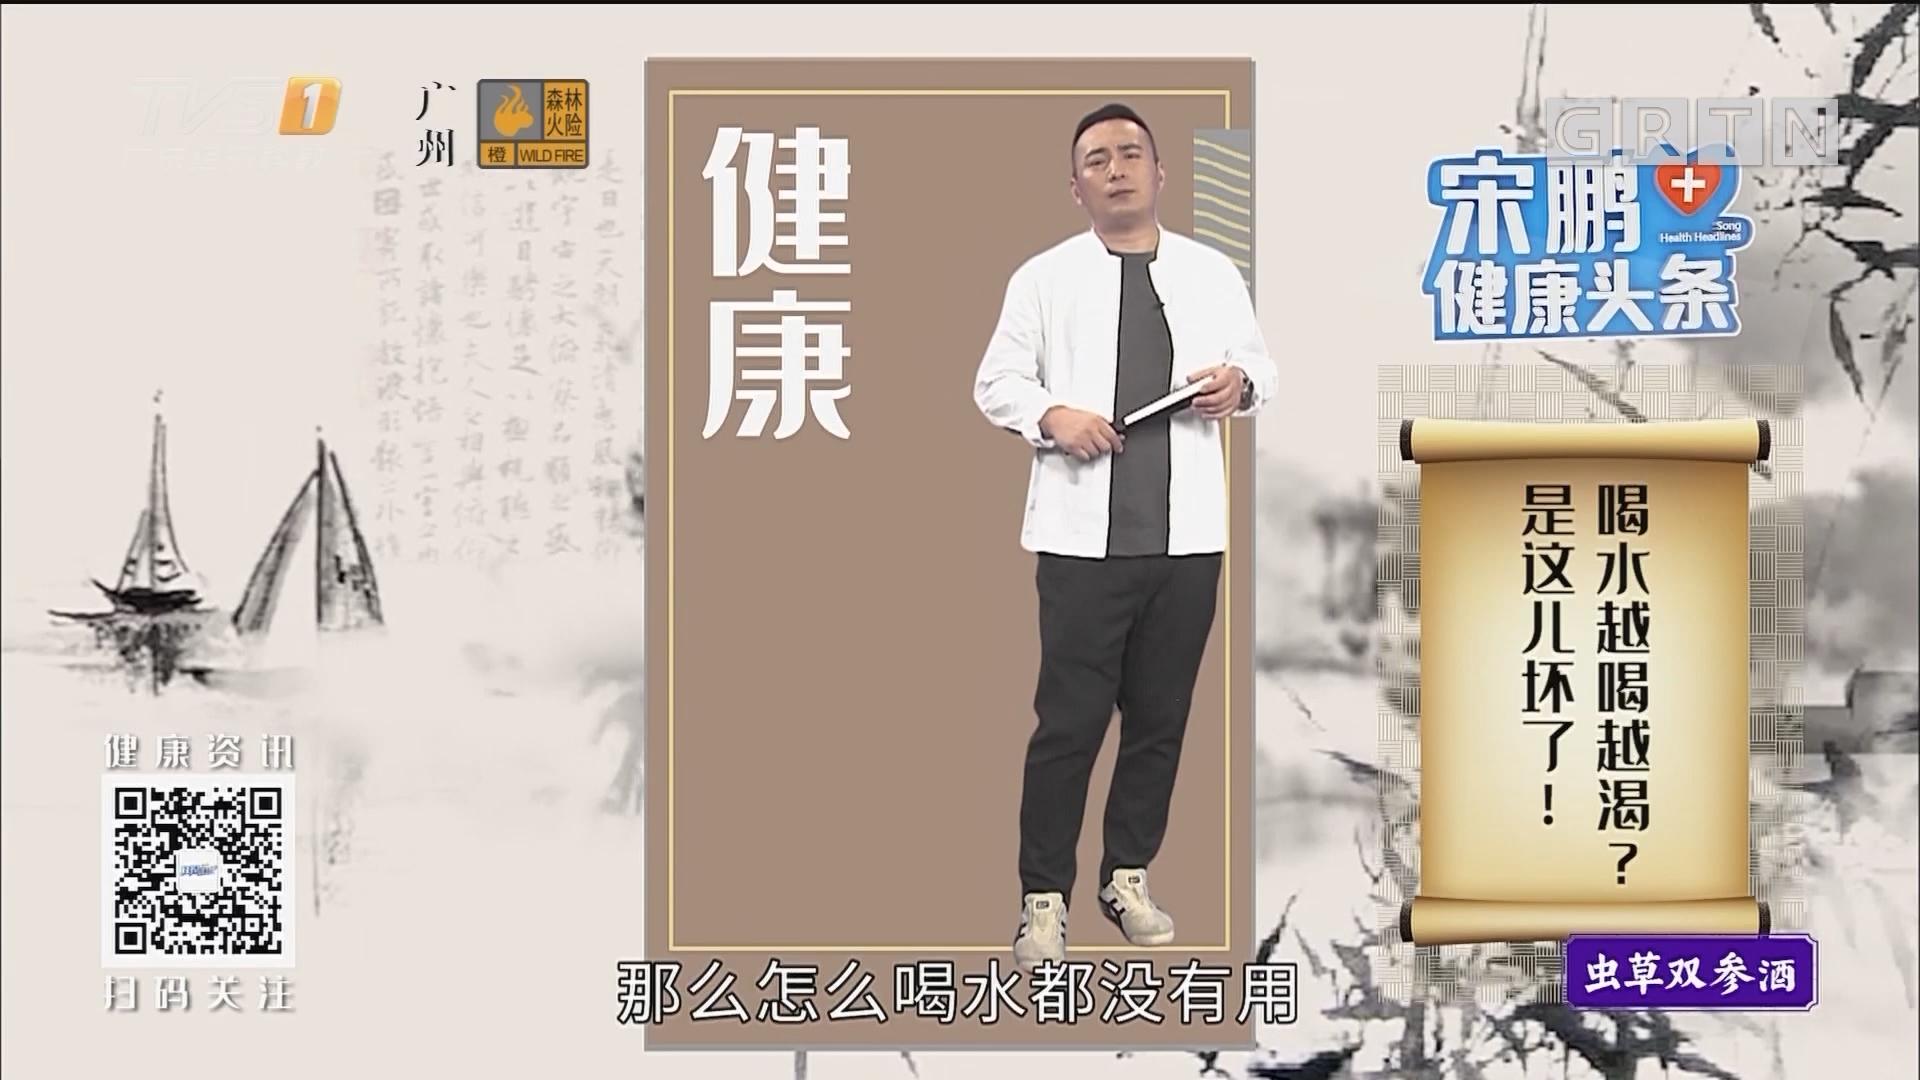 [HD][2019-09-25]经视健康+:宋鹏健康头条:喝水越喝越渴?是这儿坏了!